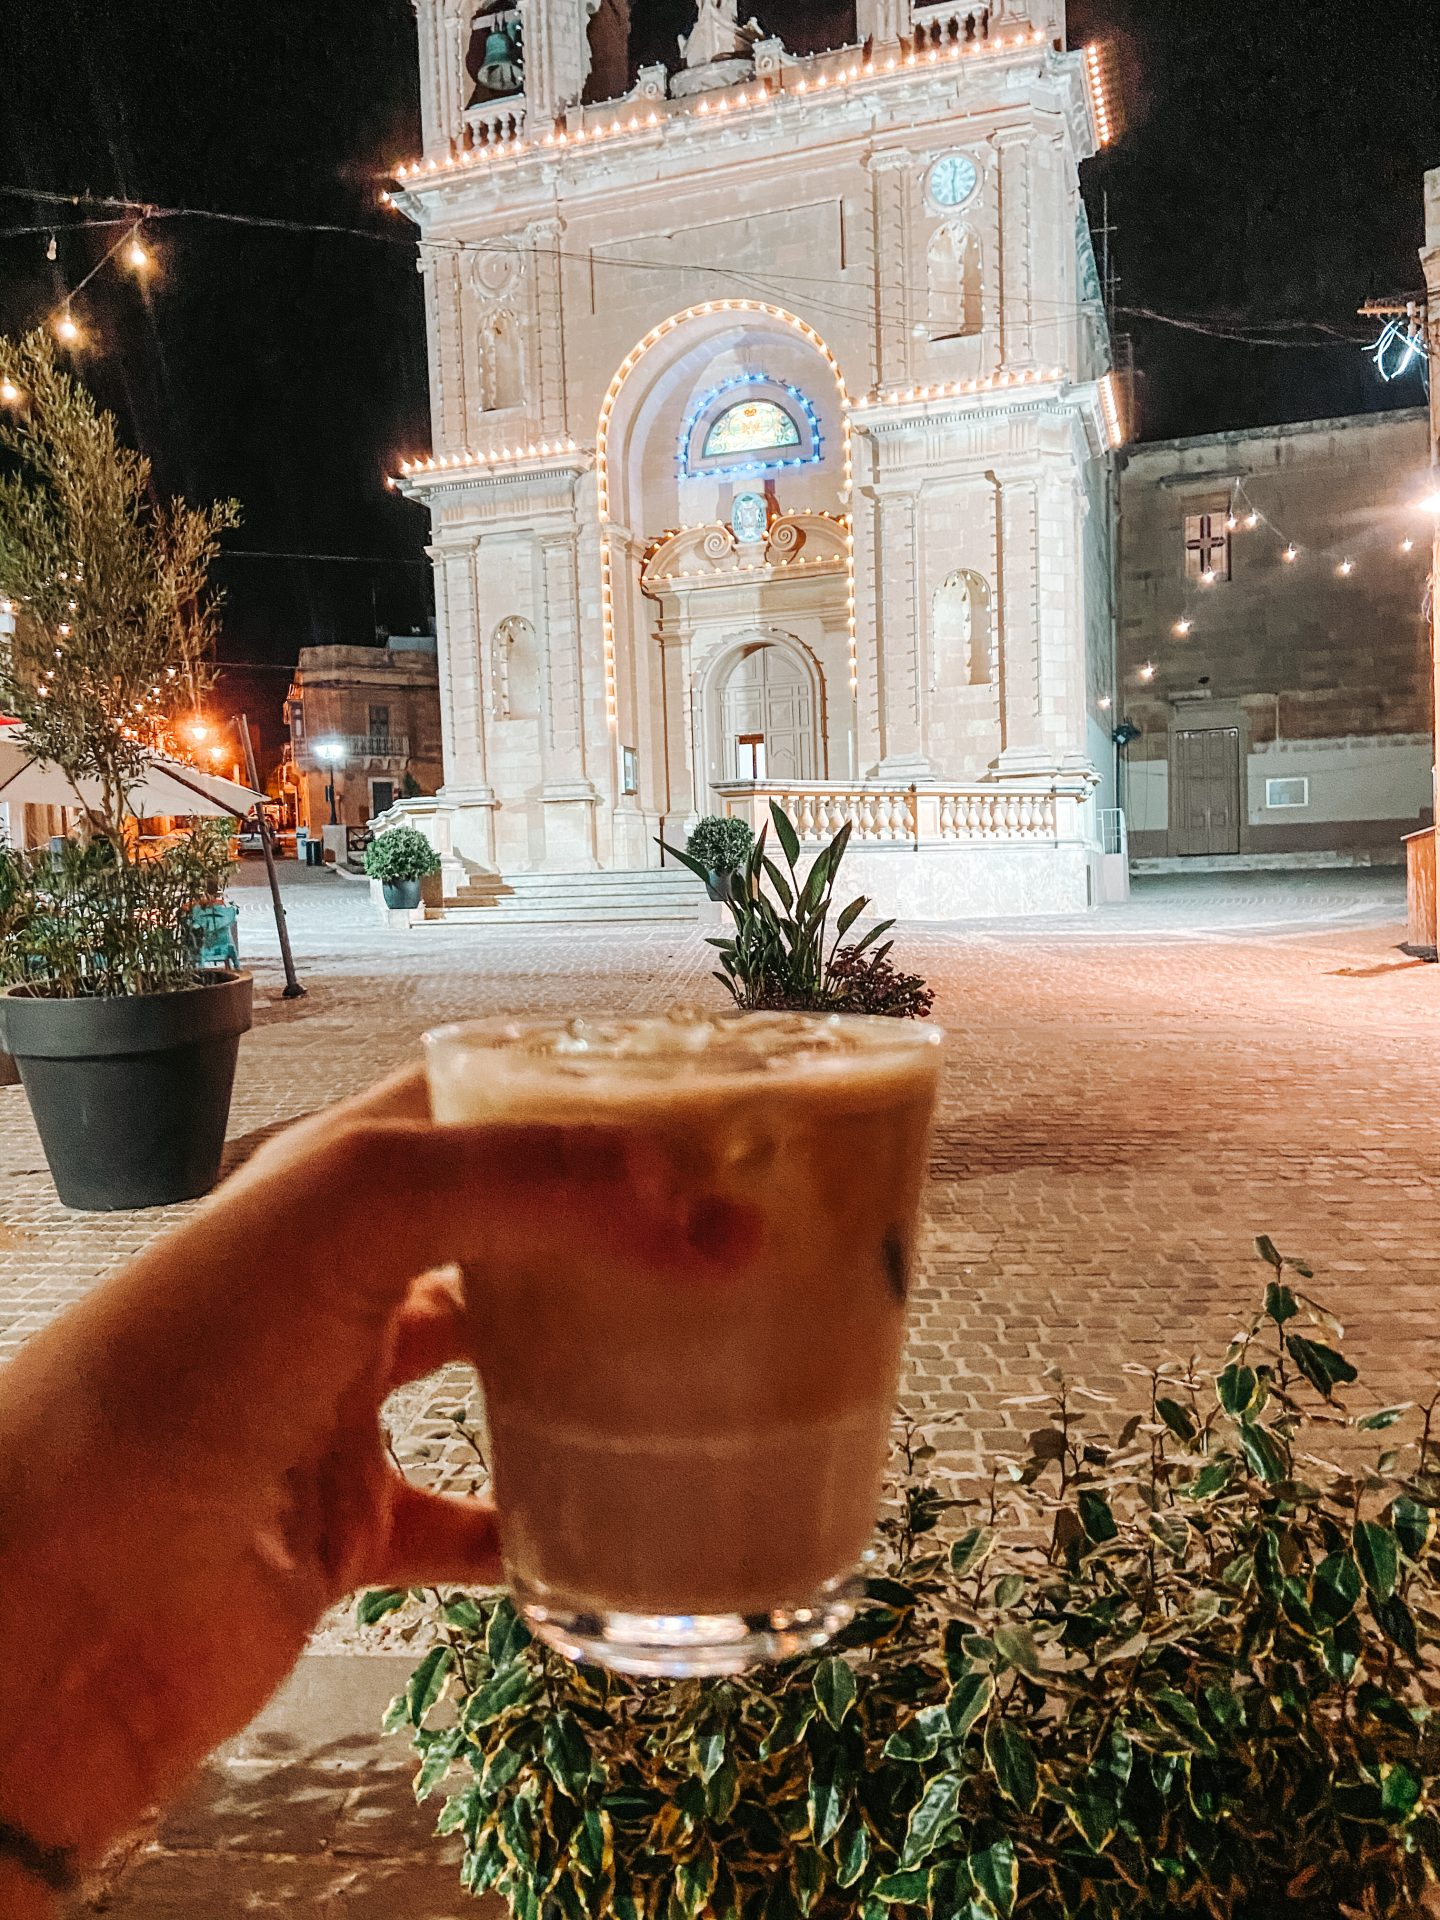 costa-coffee-marsaxlokk-malta-iced-coffee